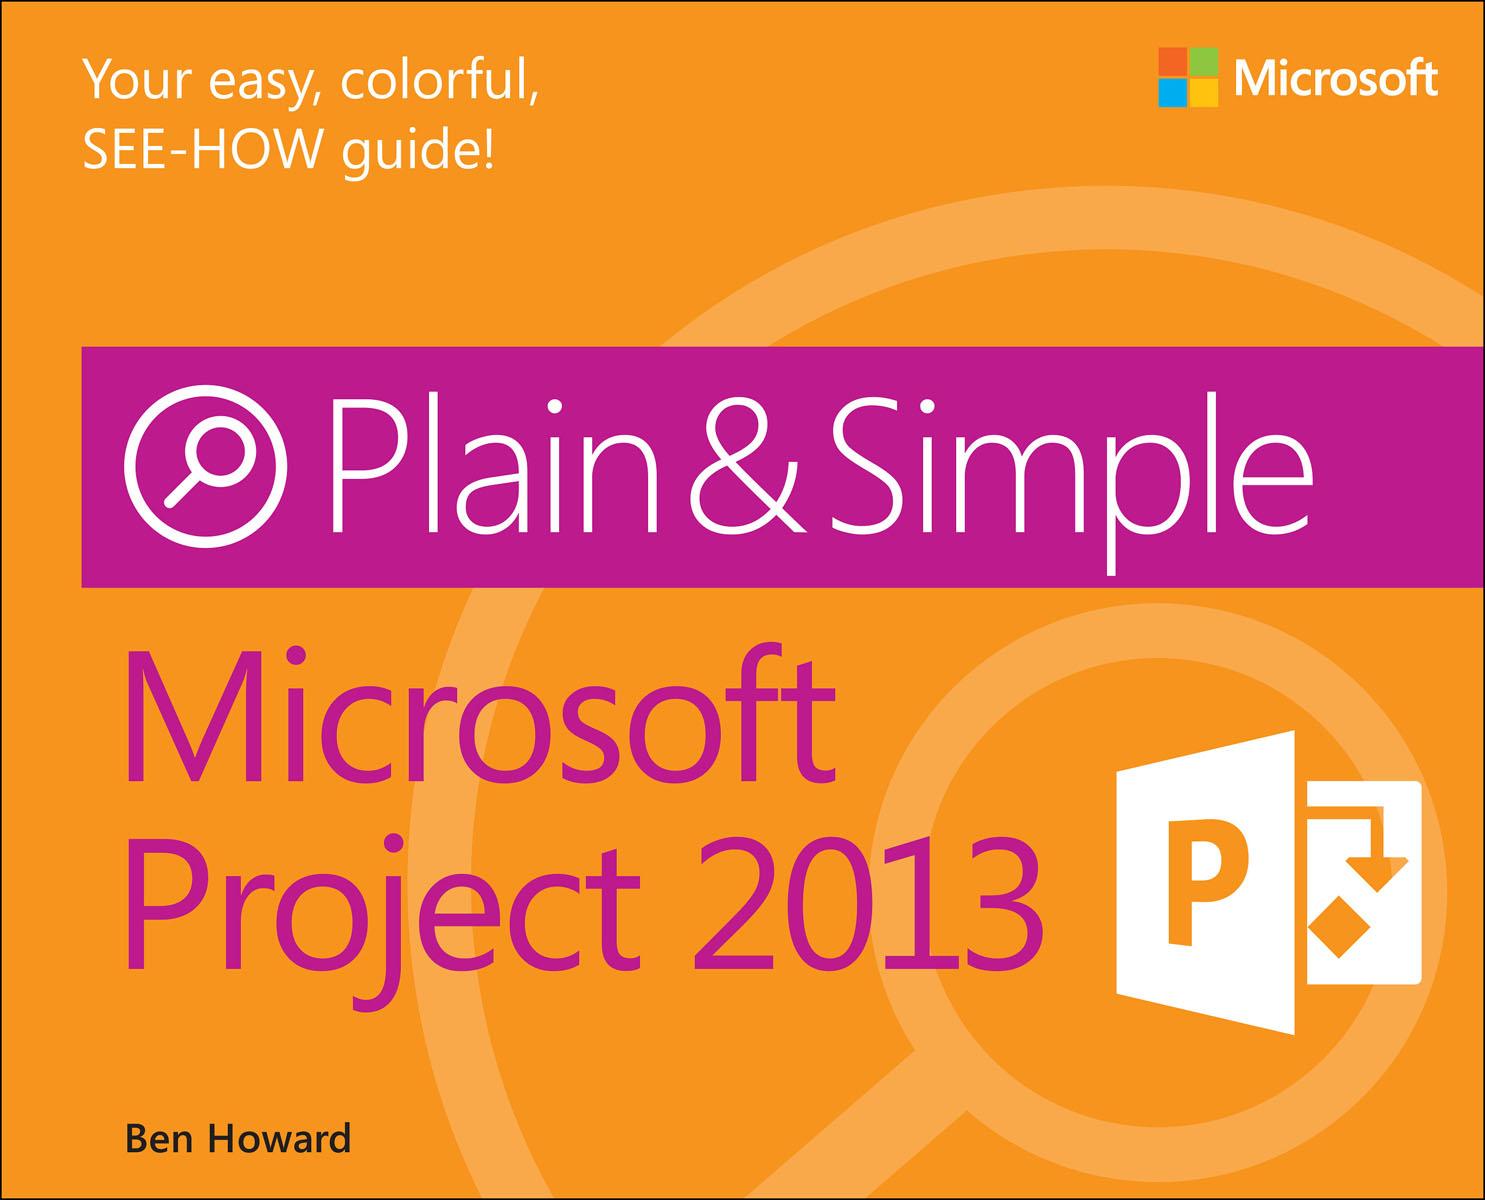 Howard. Microsoft Project 2013 Plain & Simple